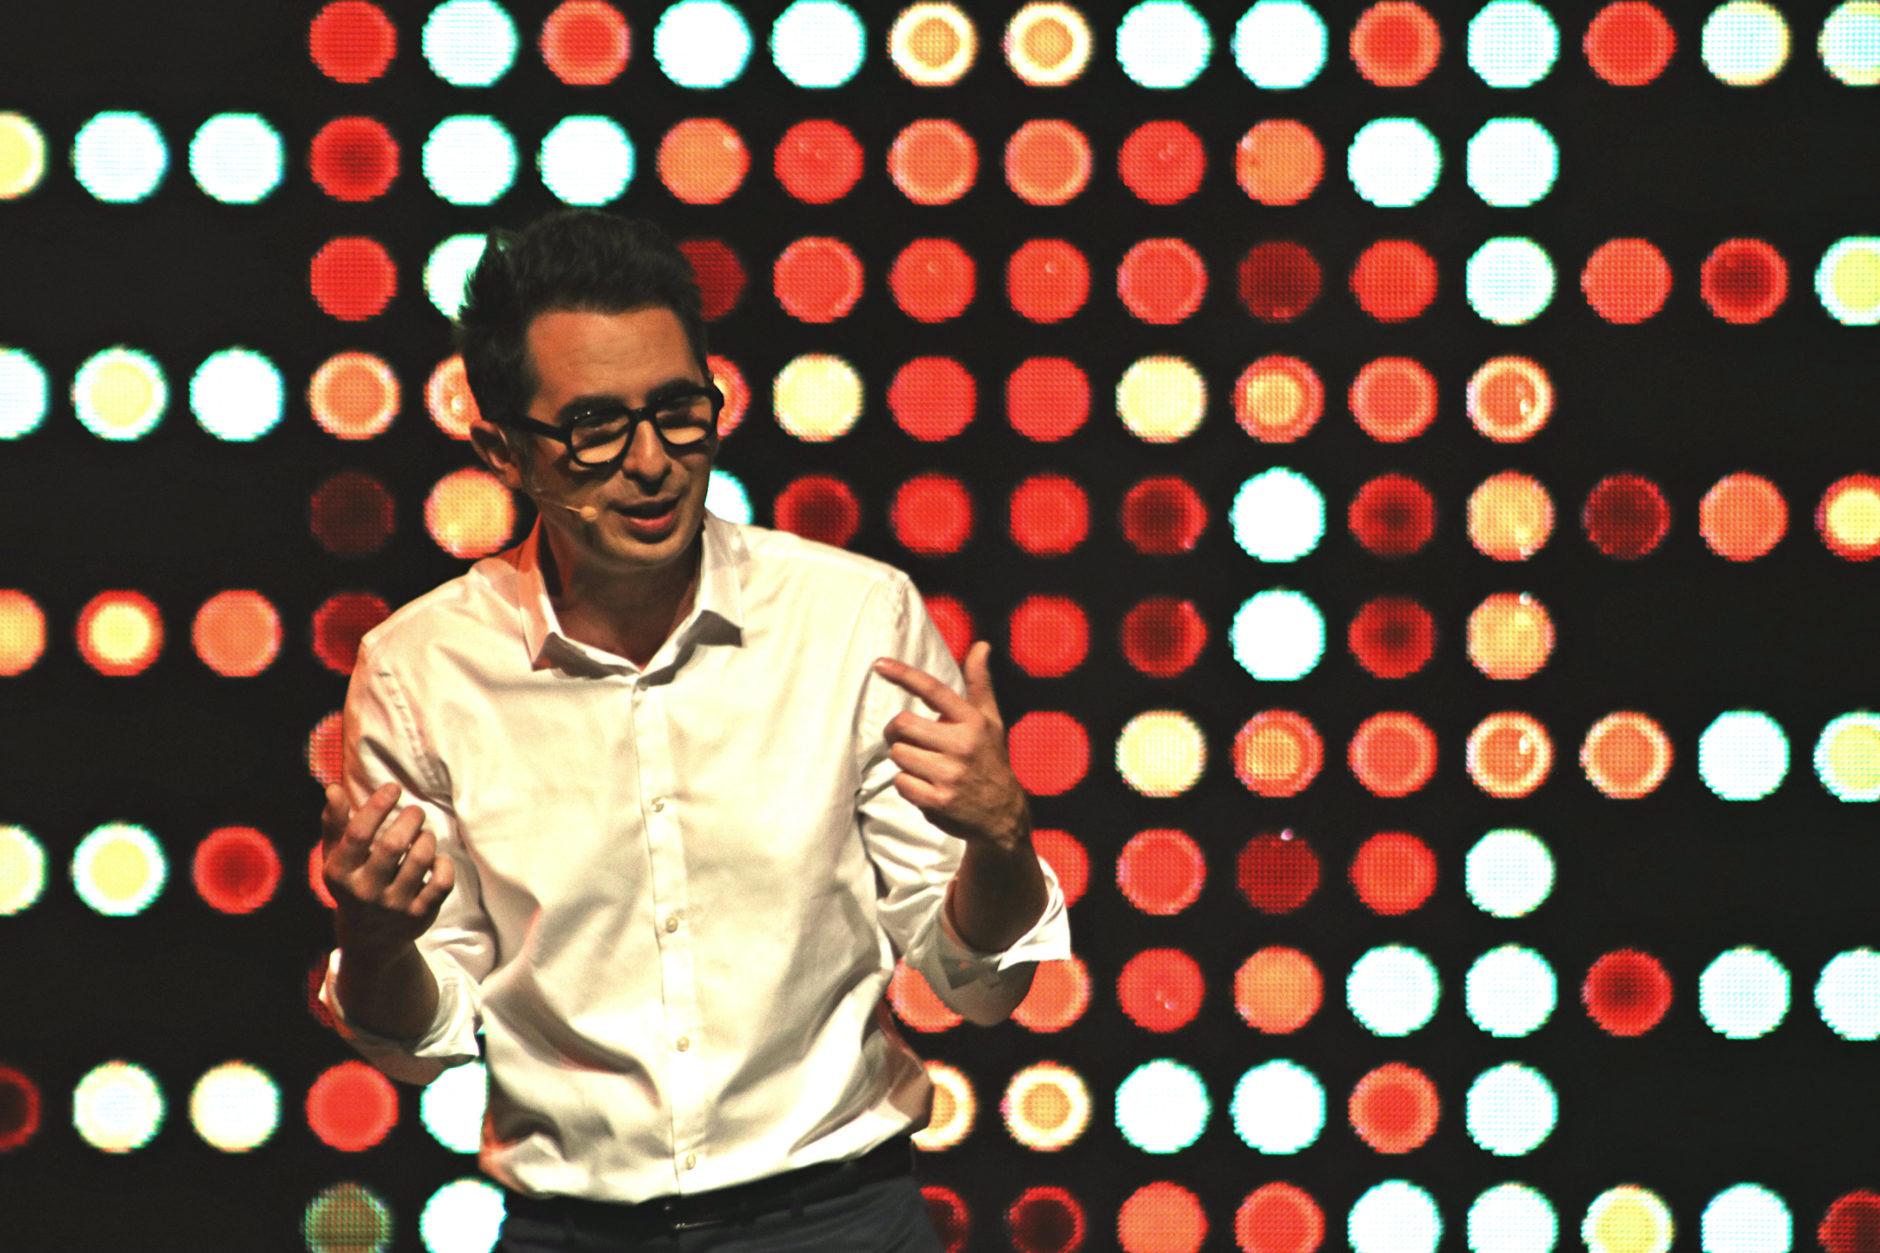 Berto Romero – Mucha tontería 2